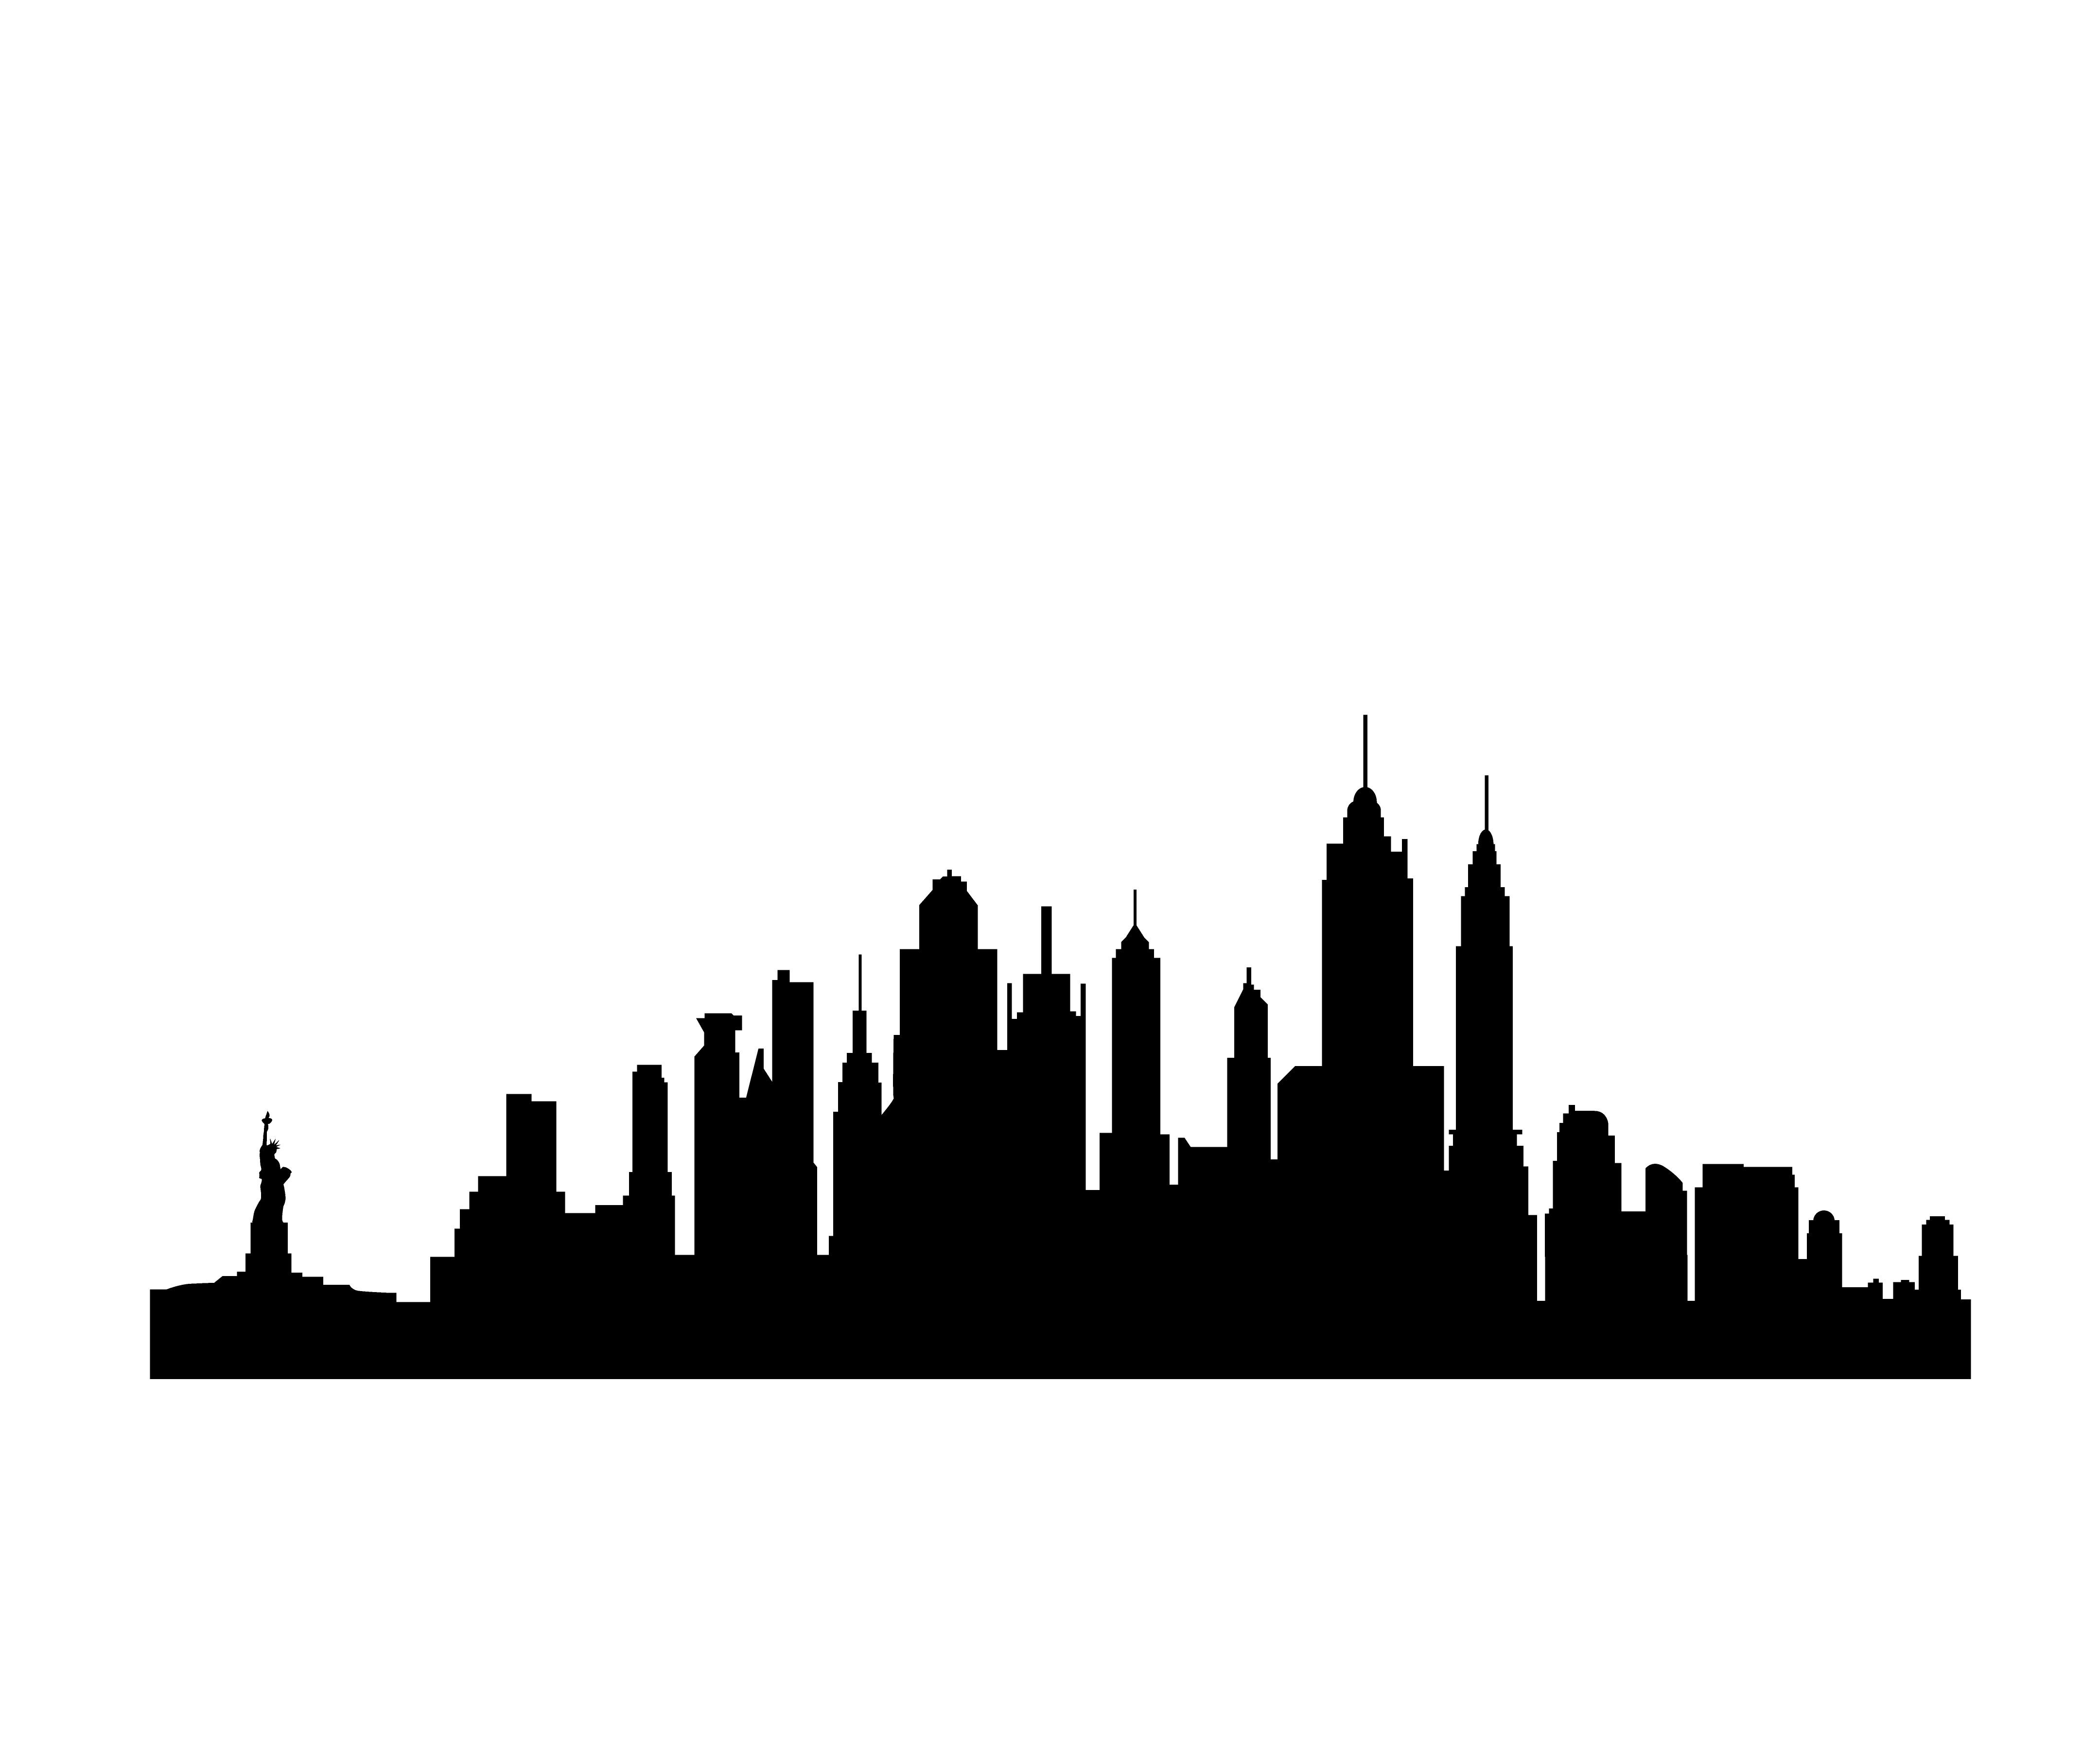 new york city skyline clip art clipart panda free clipart images rh clipartpanda com city clipart city clipart png